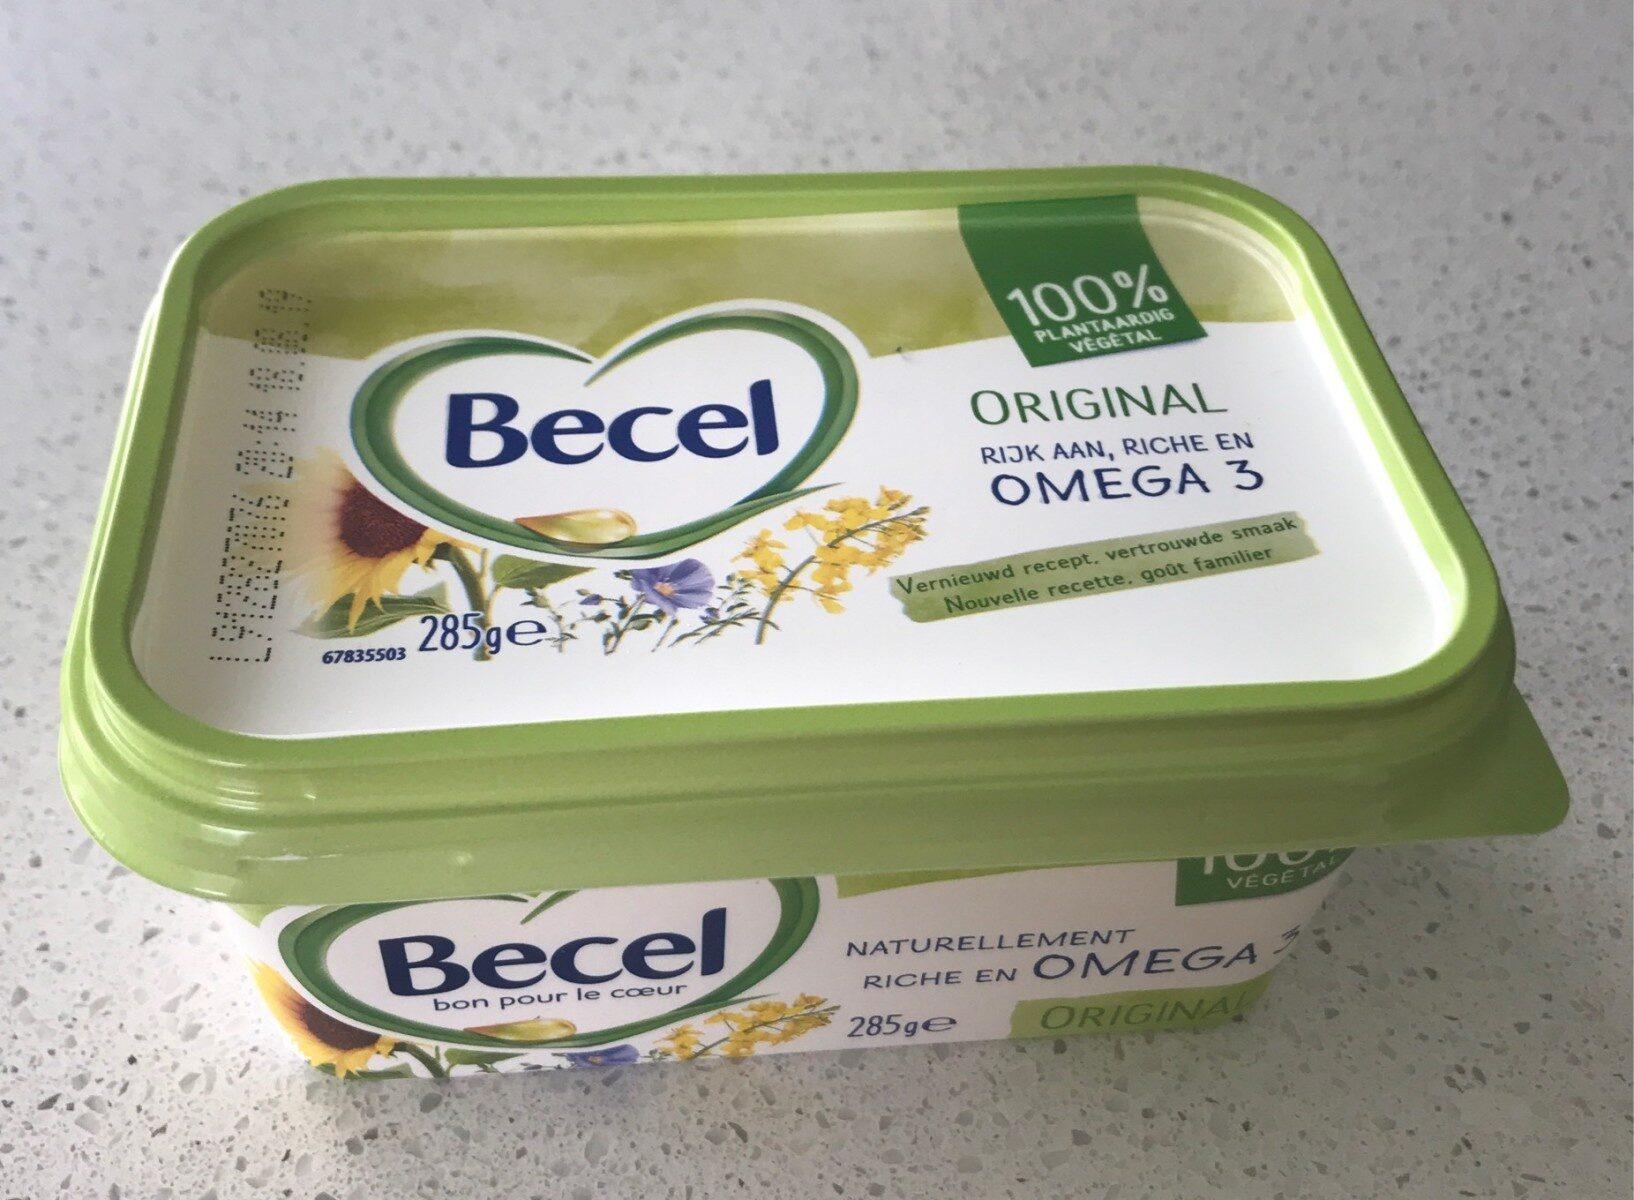 Becel Original - Product - fr